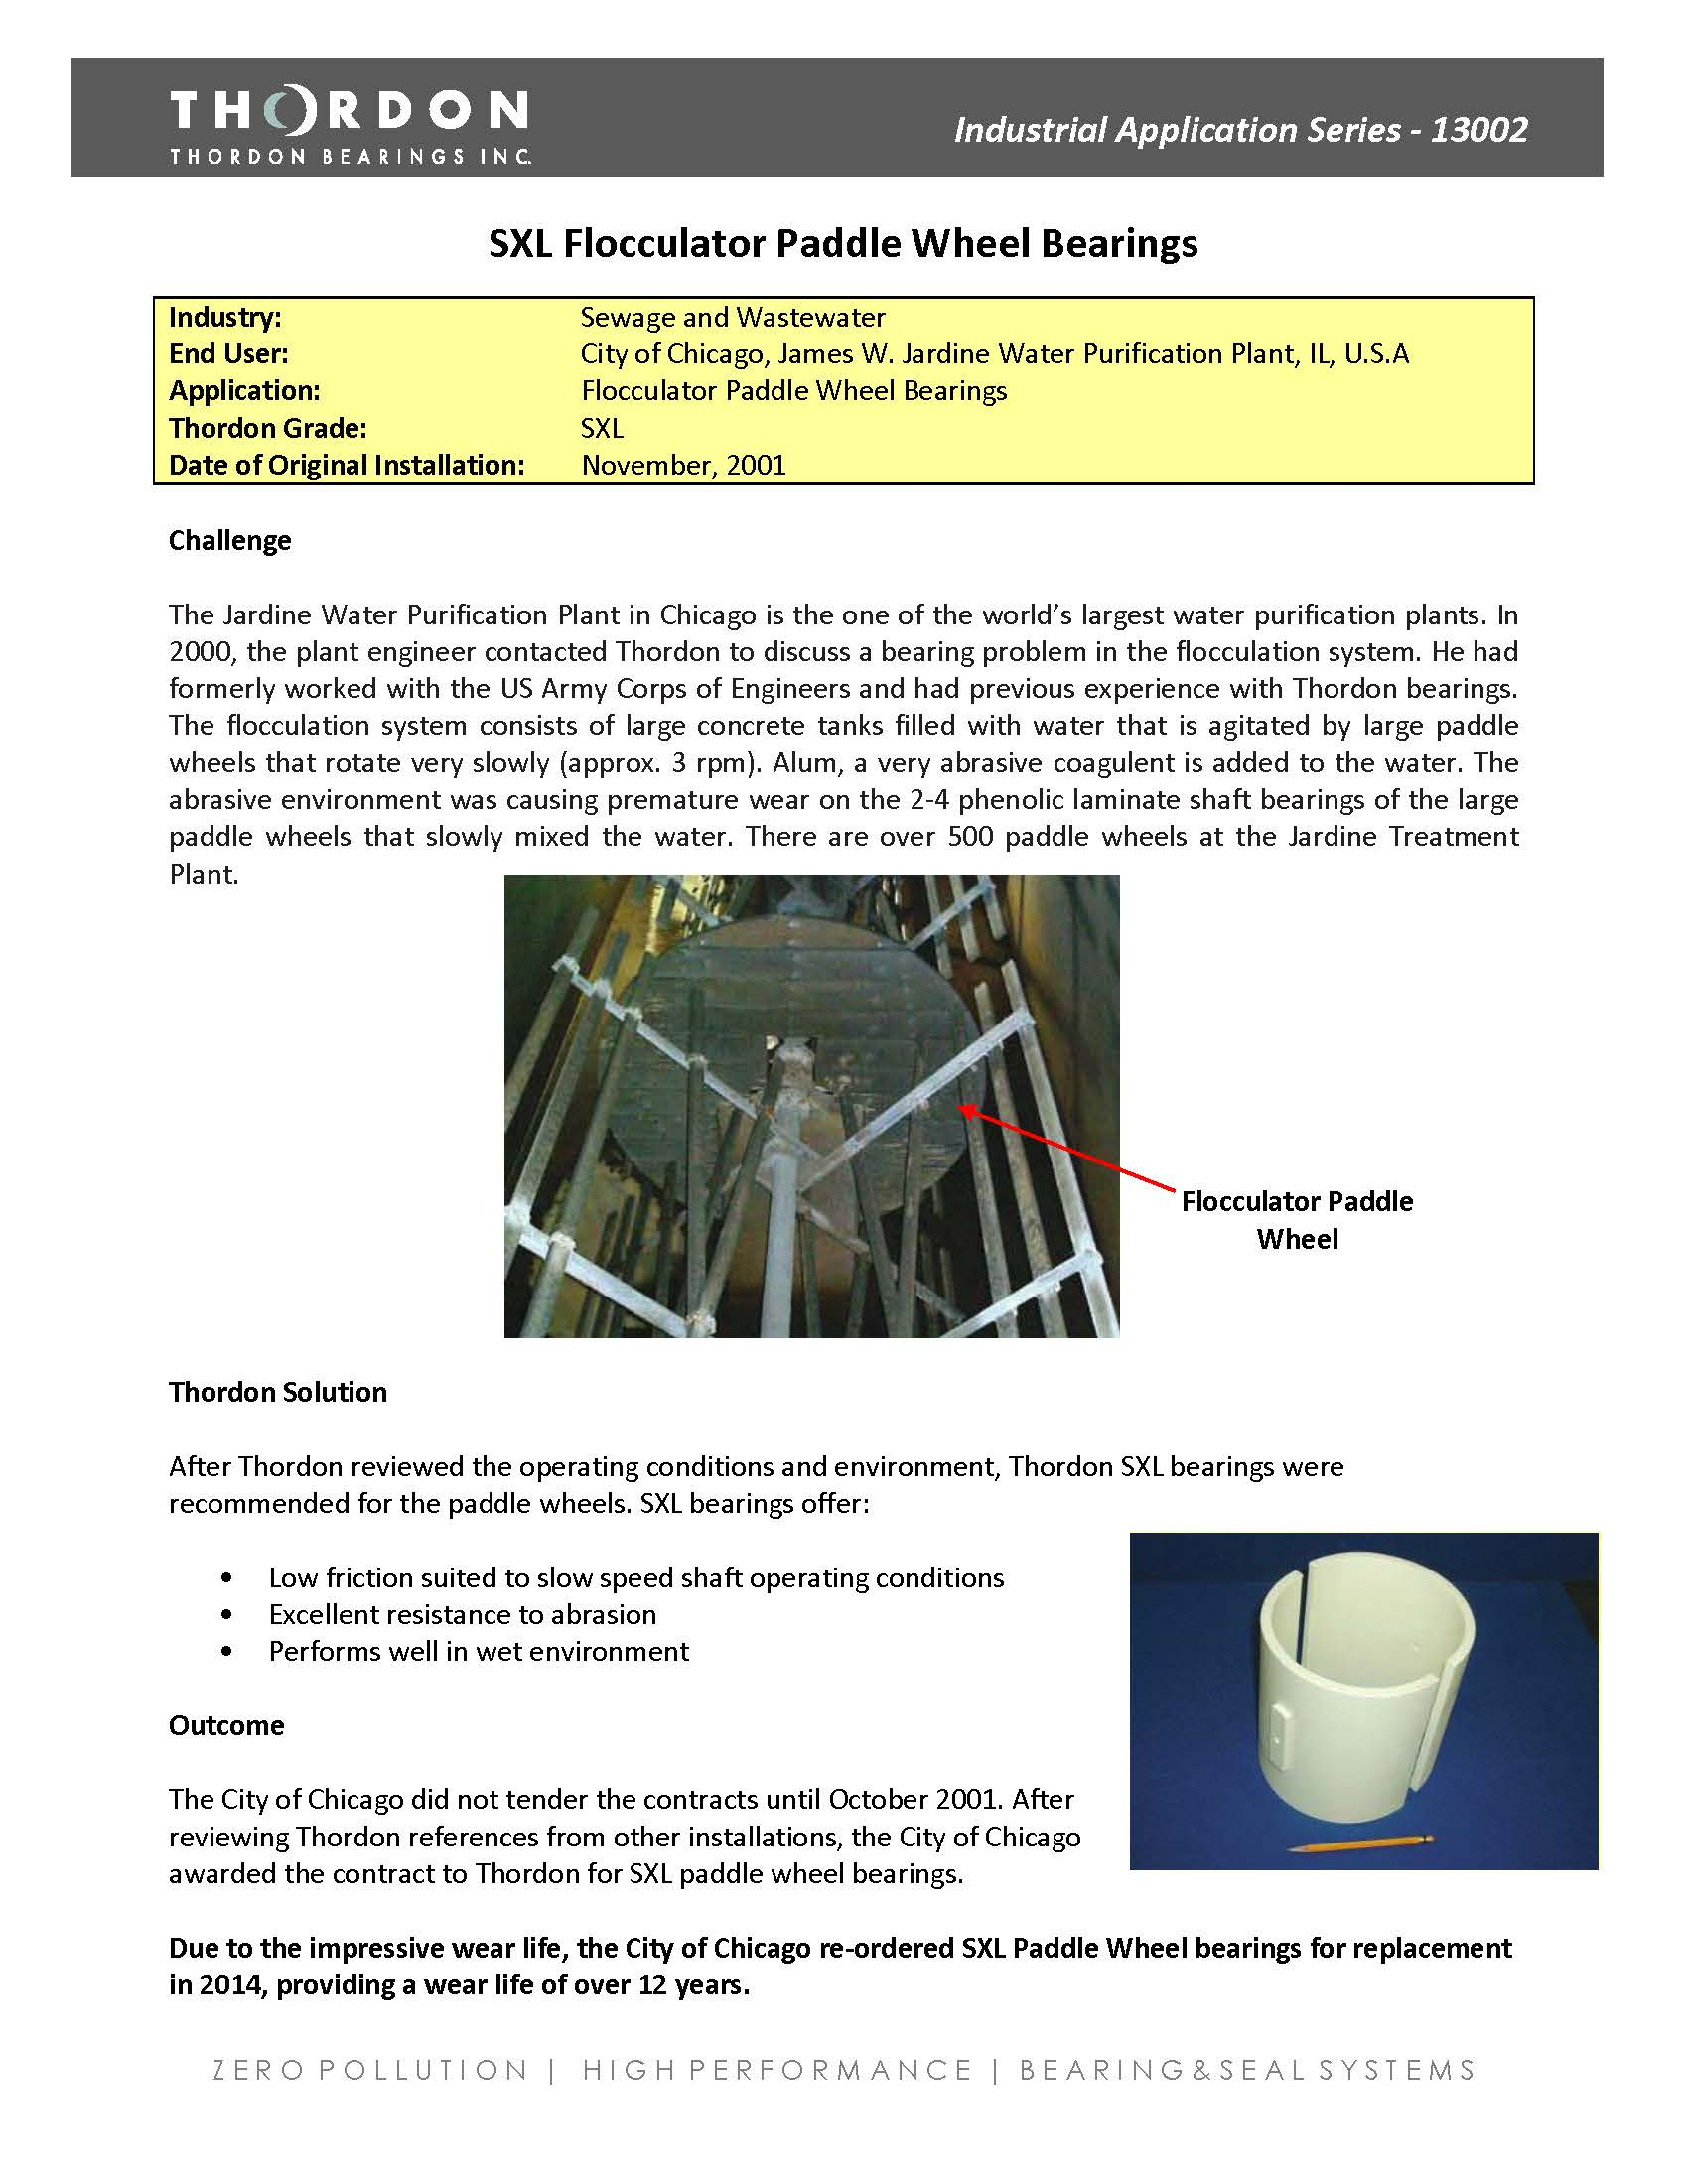 13002- SXL Flocculator Paddle Wheel Bearings